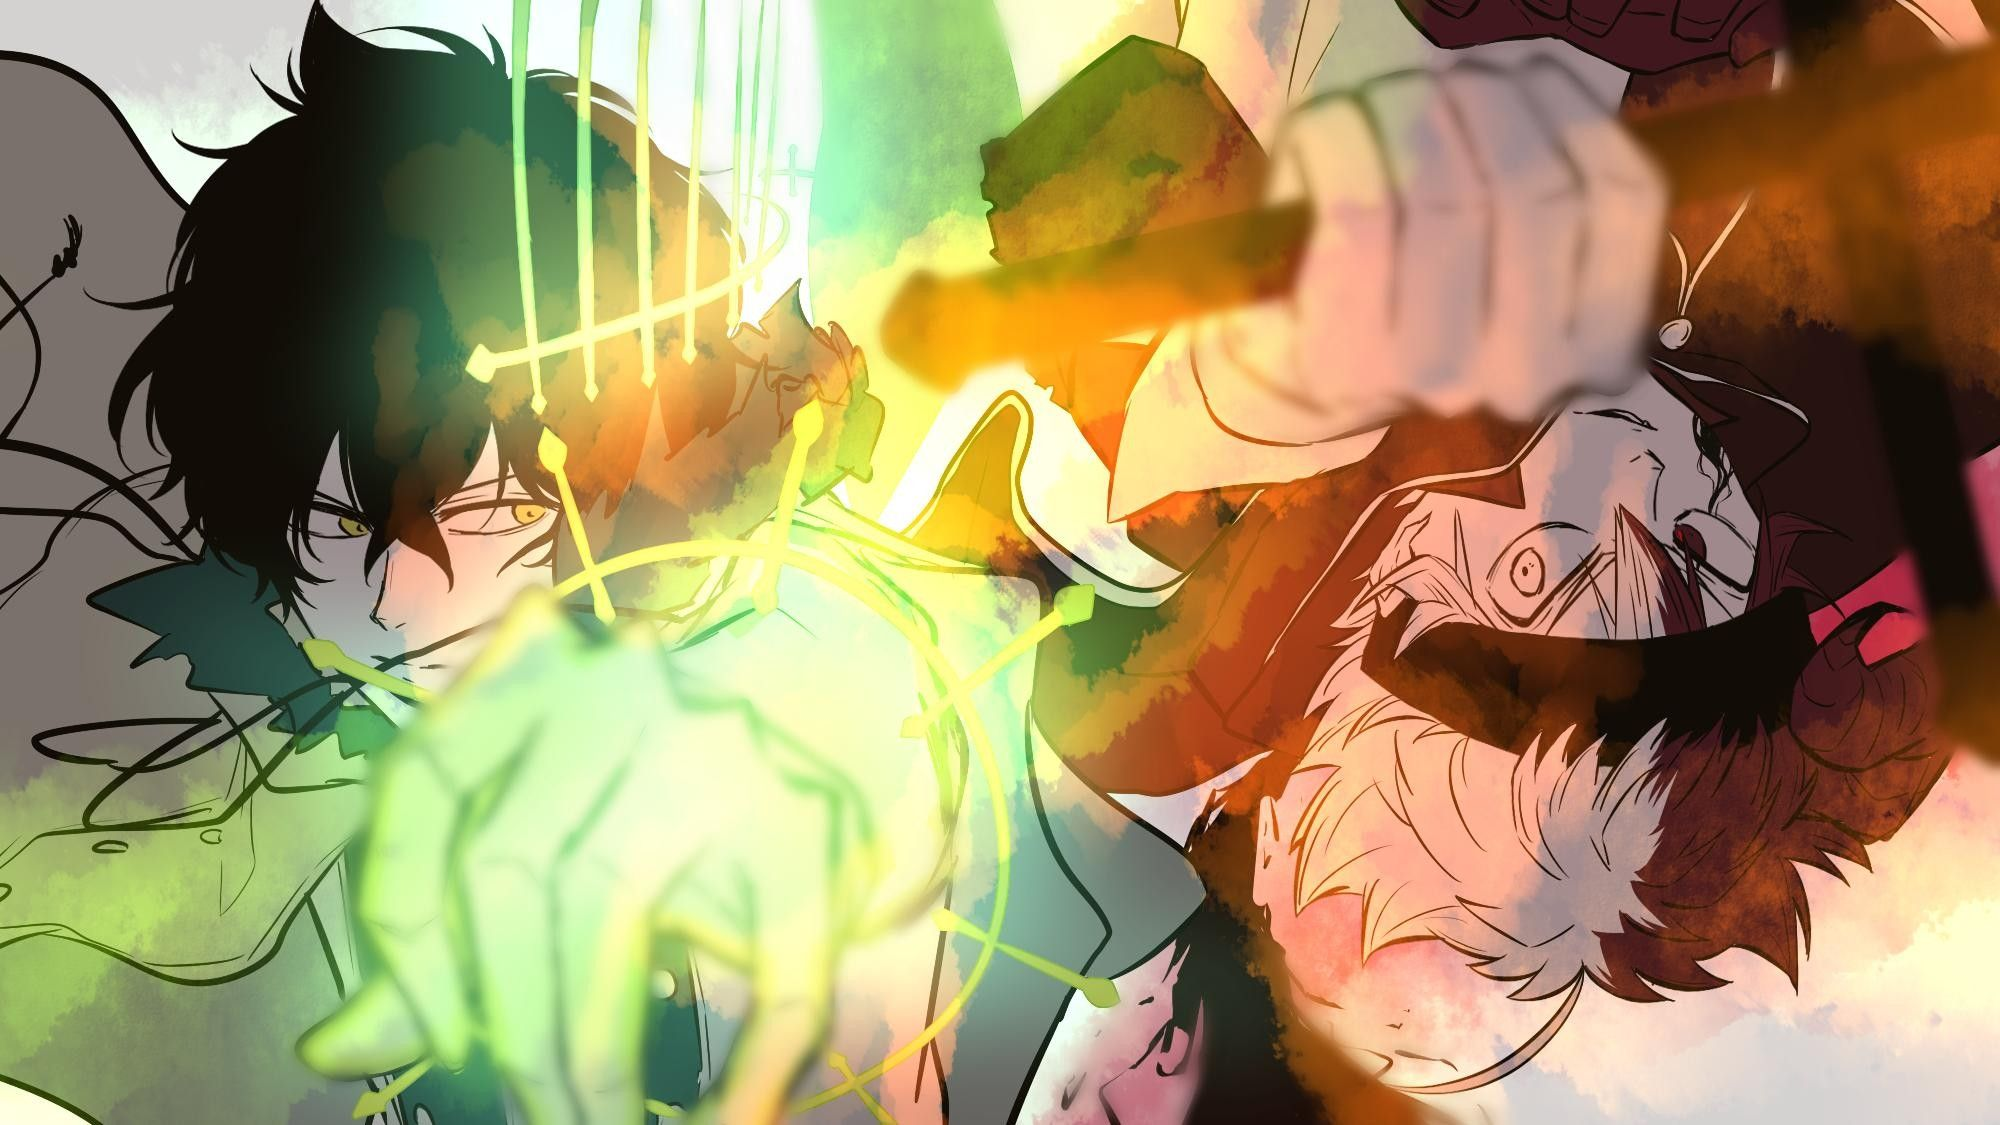 Nero black clover hd wallpaper opening theme anime 1080p. Pin by TRA1LBLAZR on ♣️ B l a c k ♣️ C l o v e r ♣️ ...